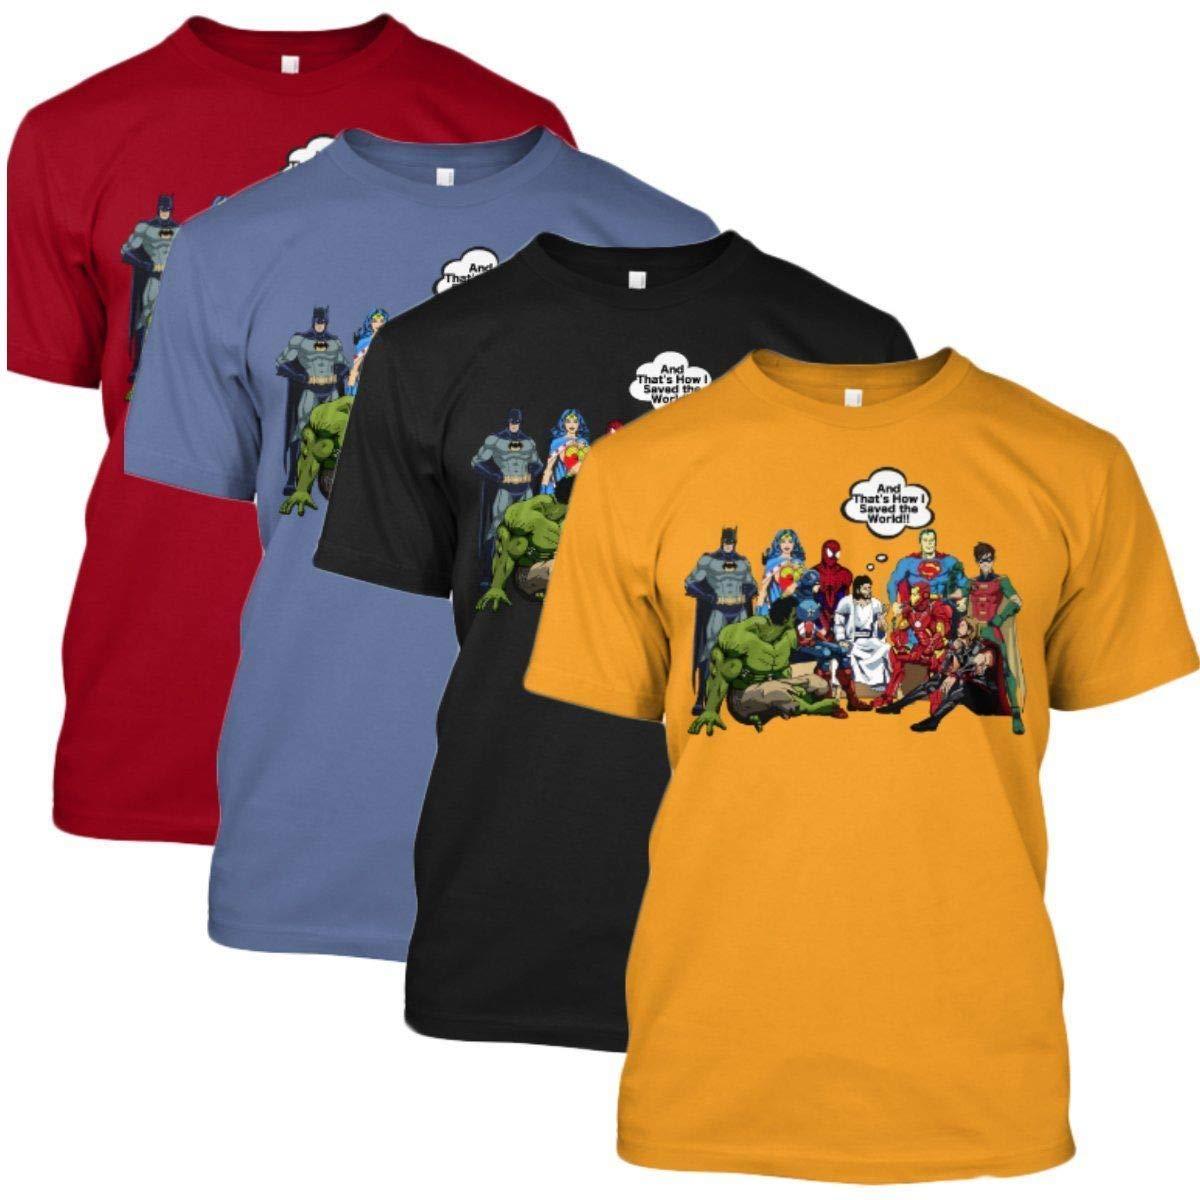 jesus and superheroes shirt